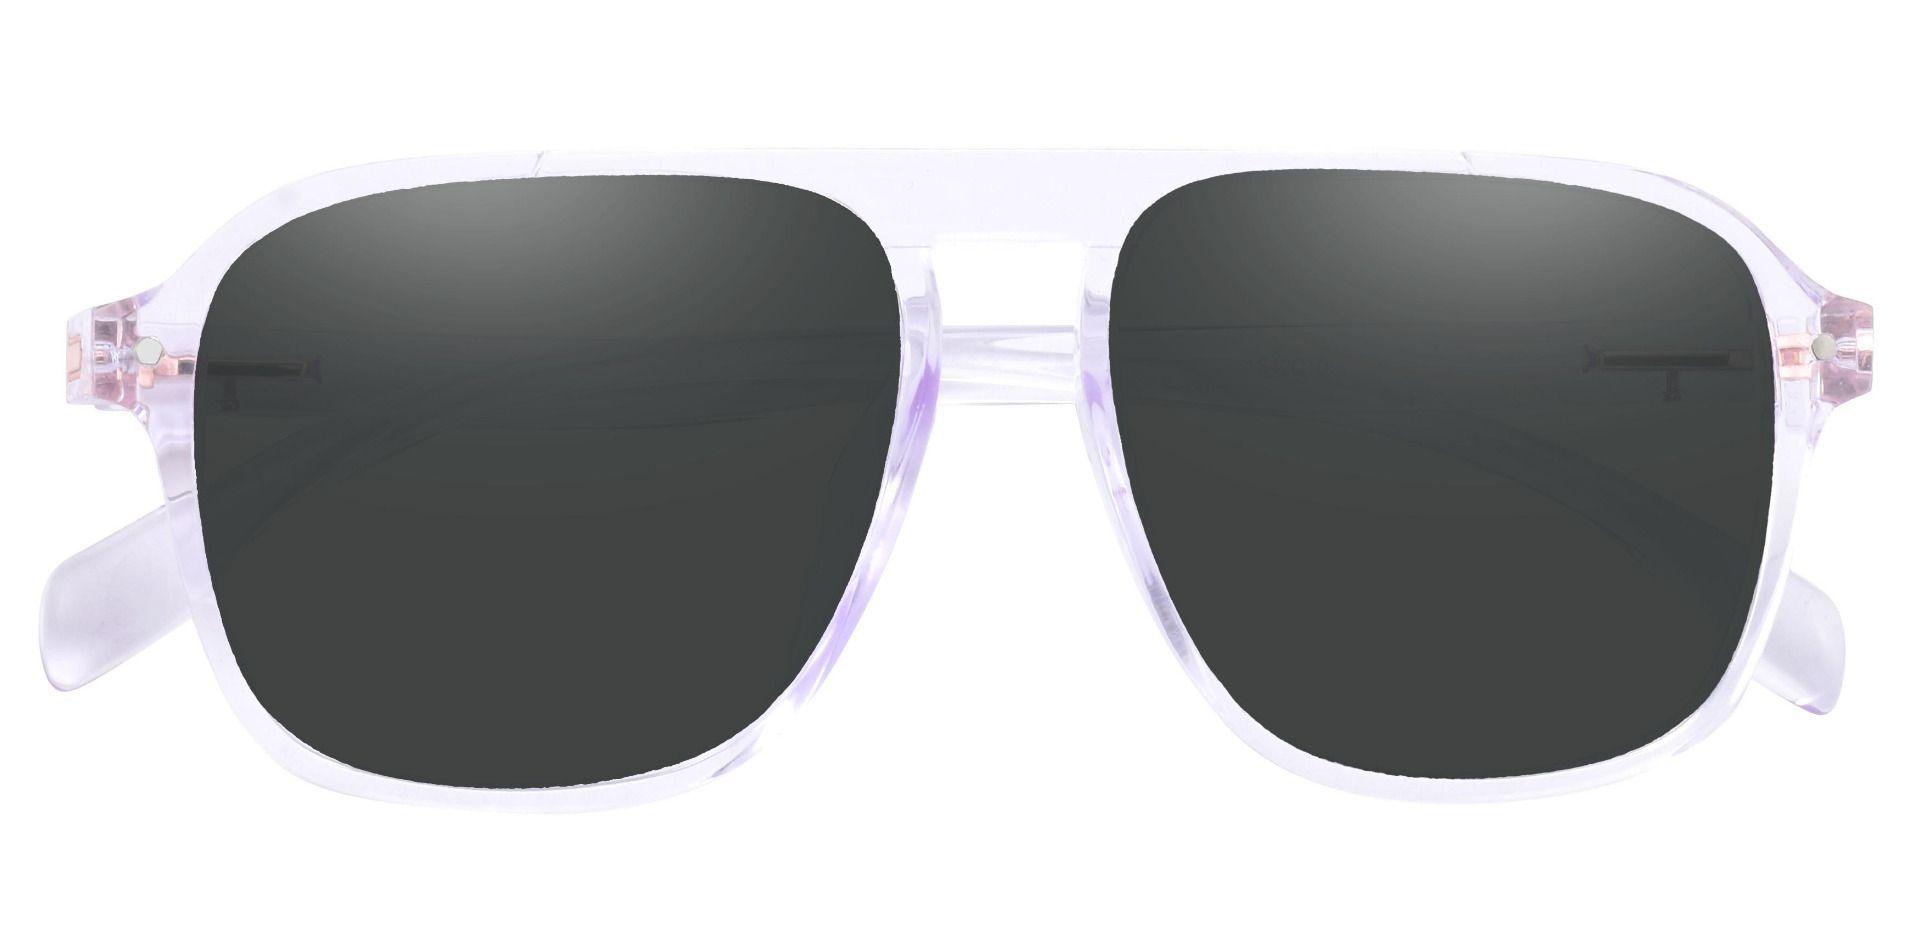 Gideon Aviator Reading Sunglasses - Clear Frame With Gray Lenses